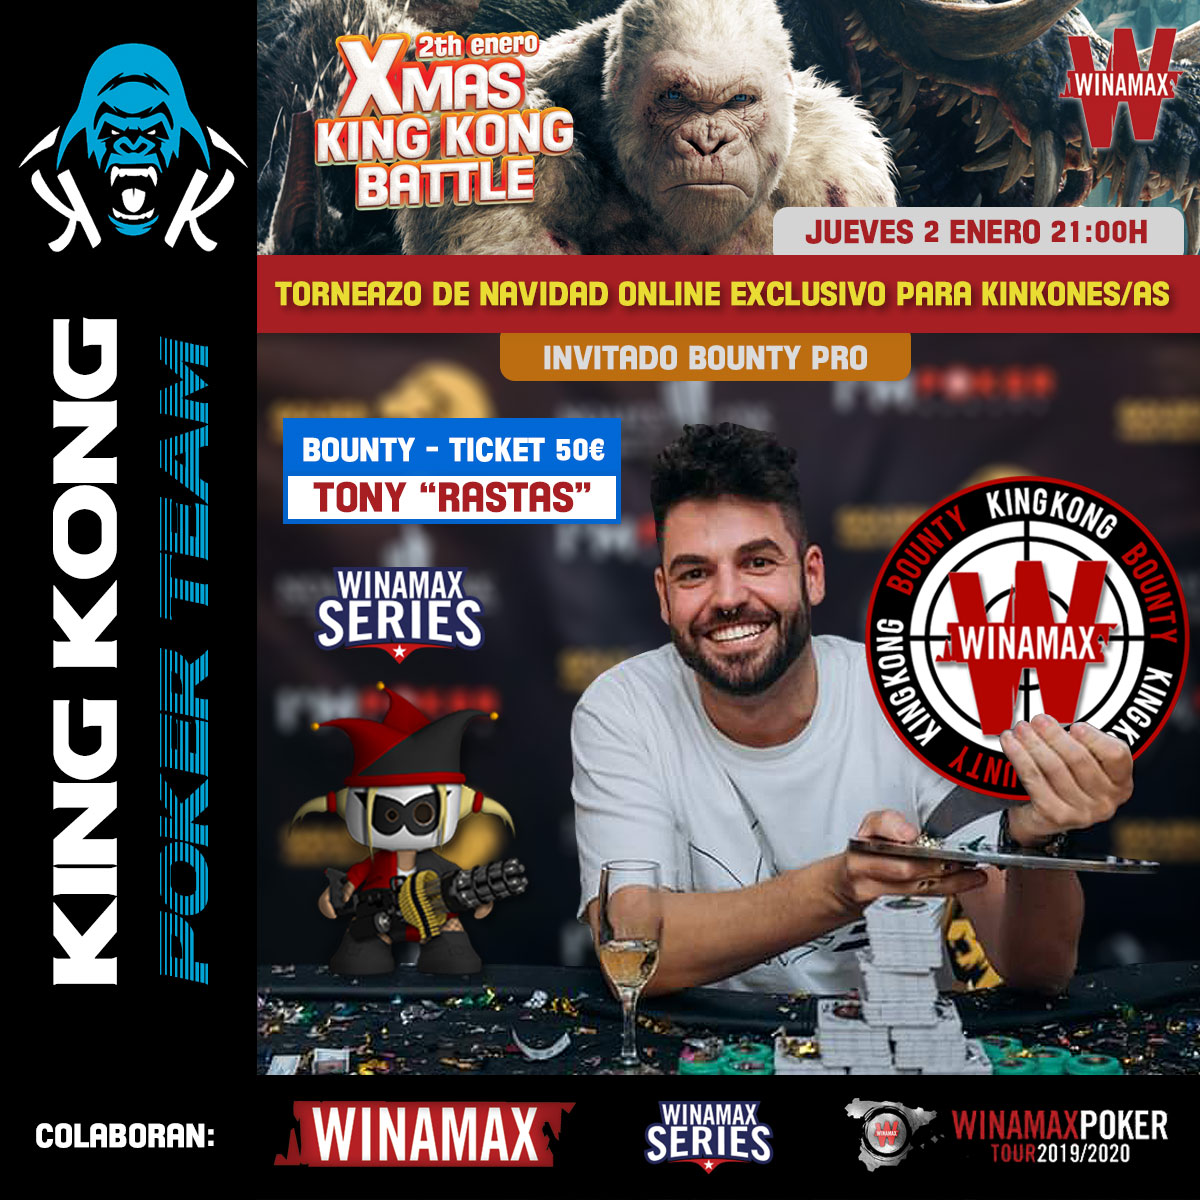 20181207_PROMO_XMAS_King_Kong_Battle_banner_bounty_web